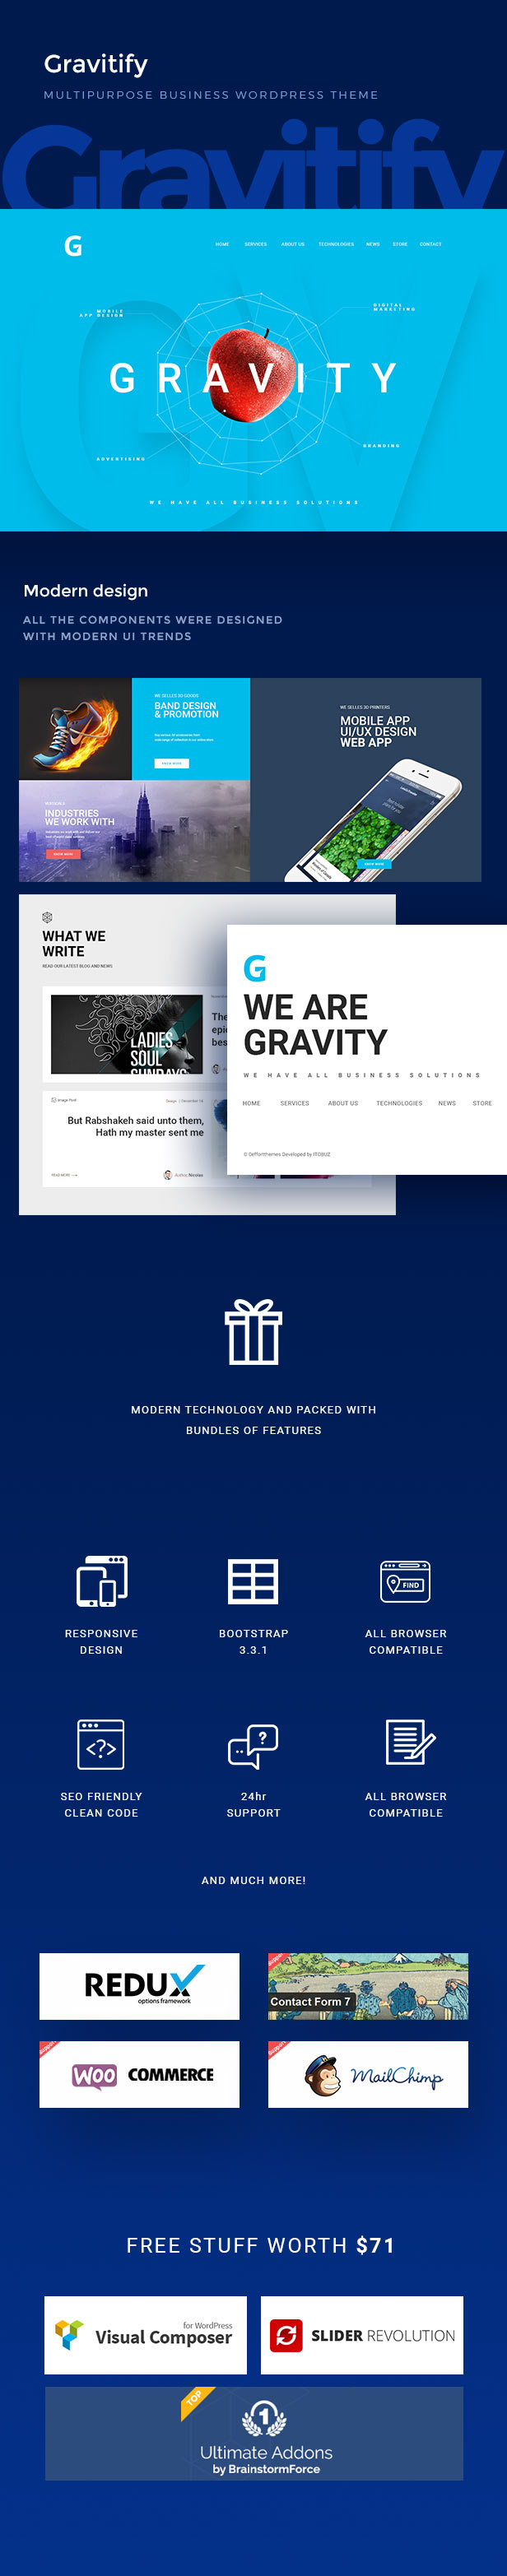 Gravitieren | Mehrzweck-Business-WordPress-Theme - 4